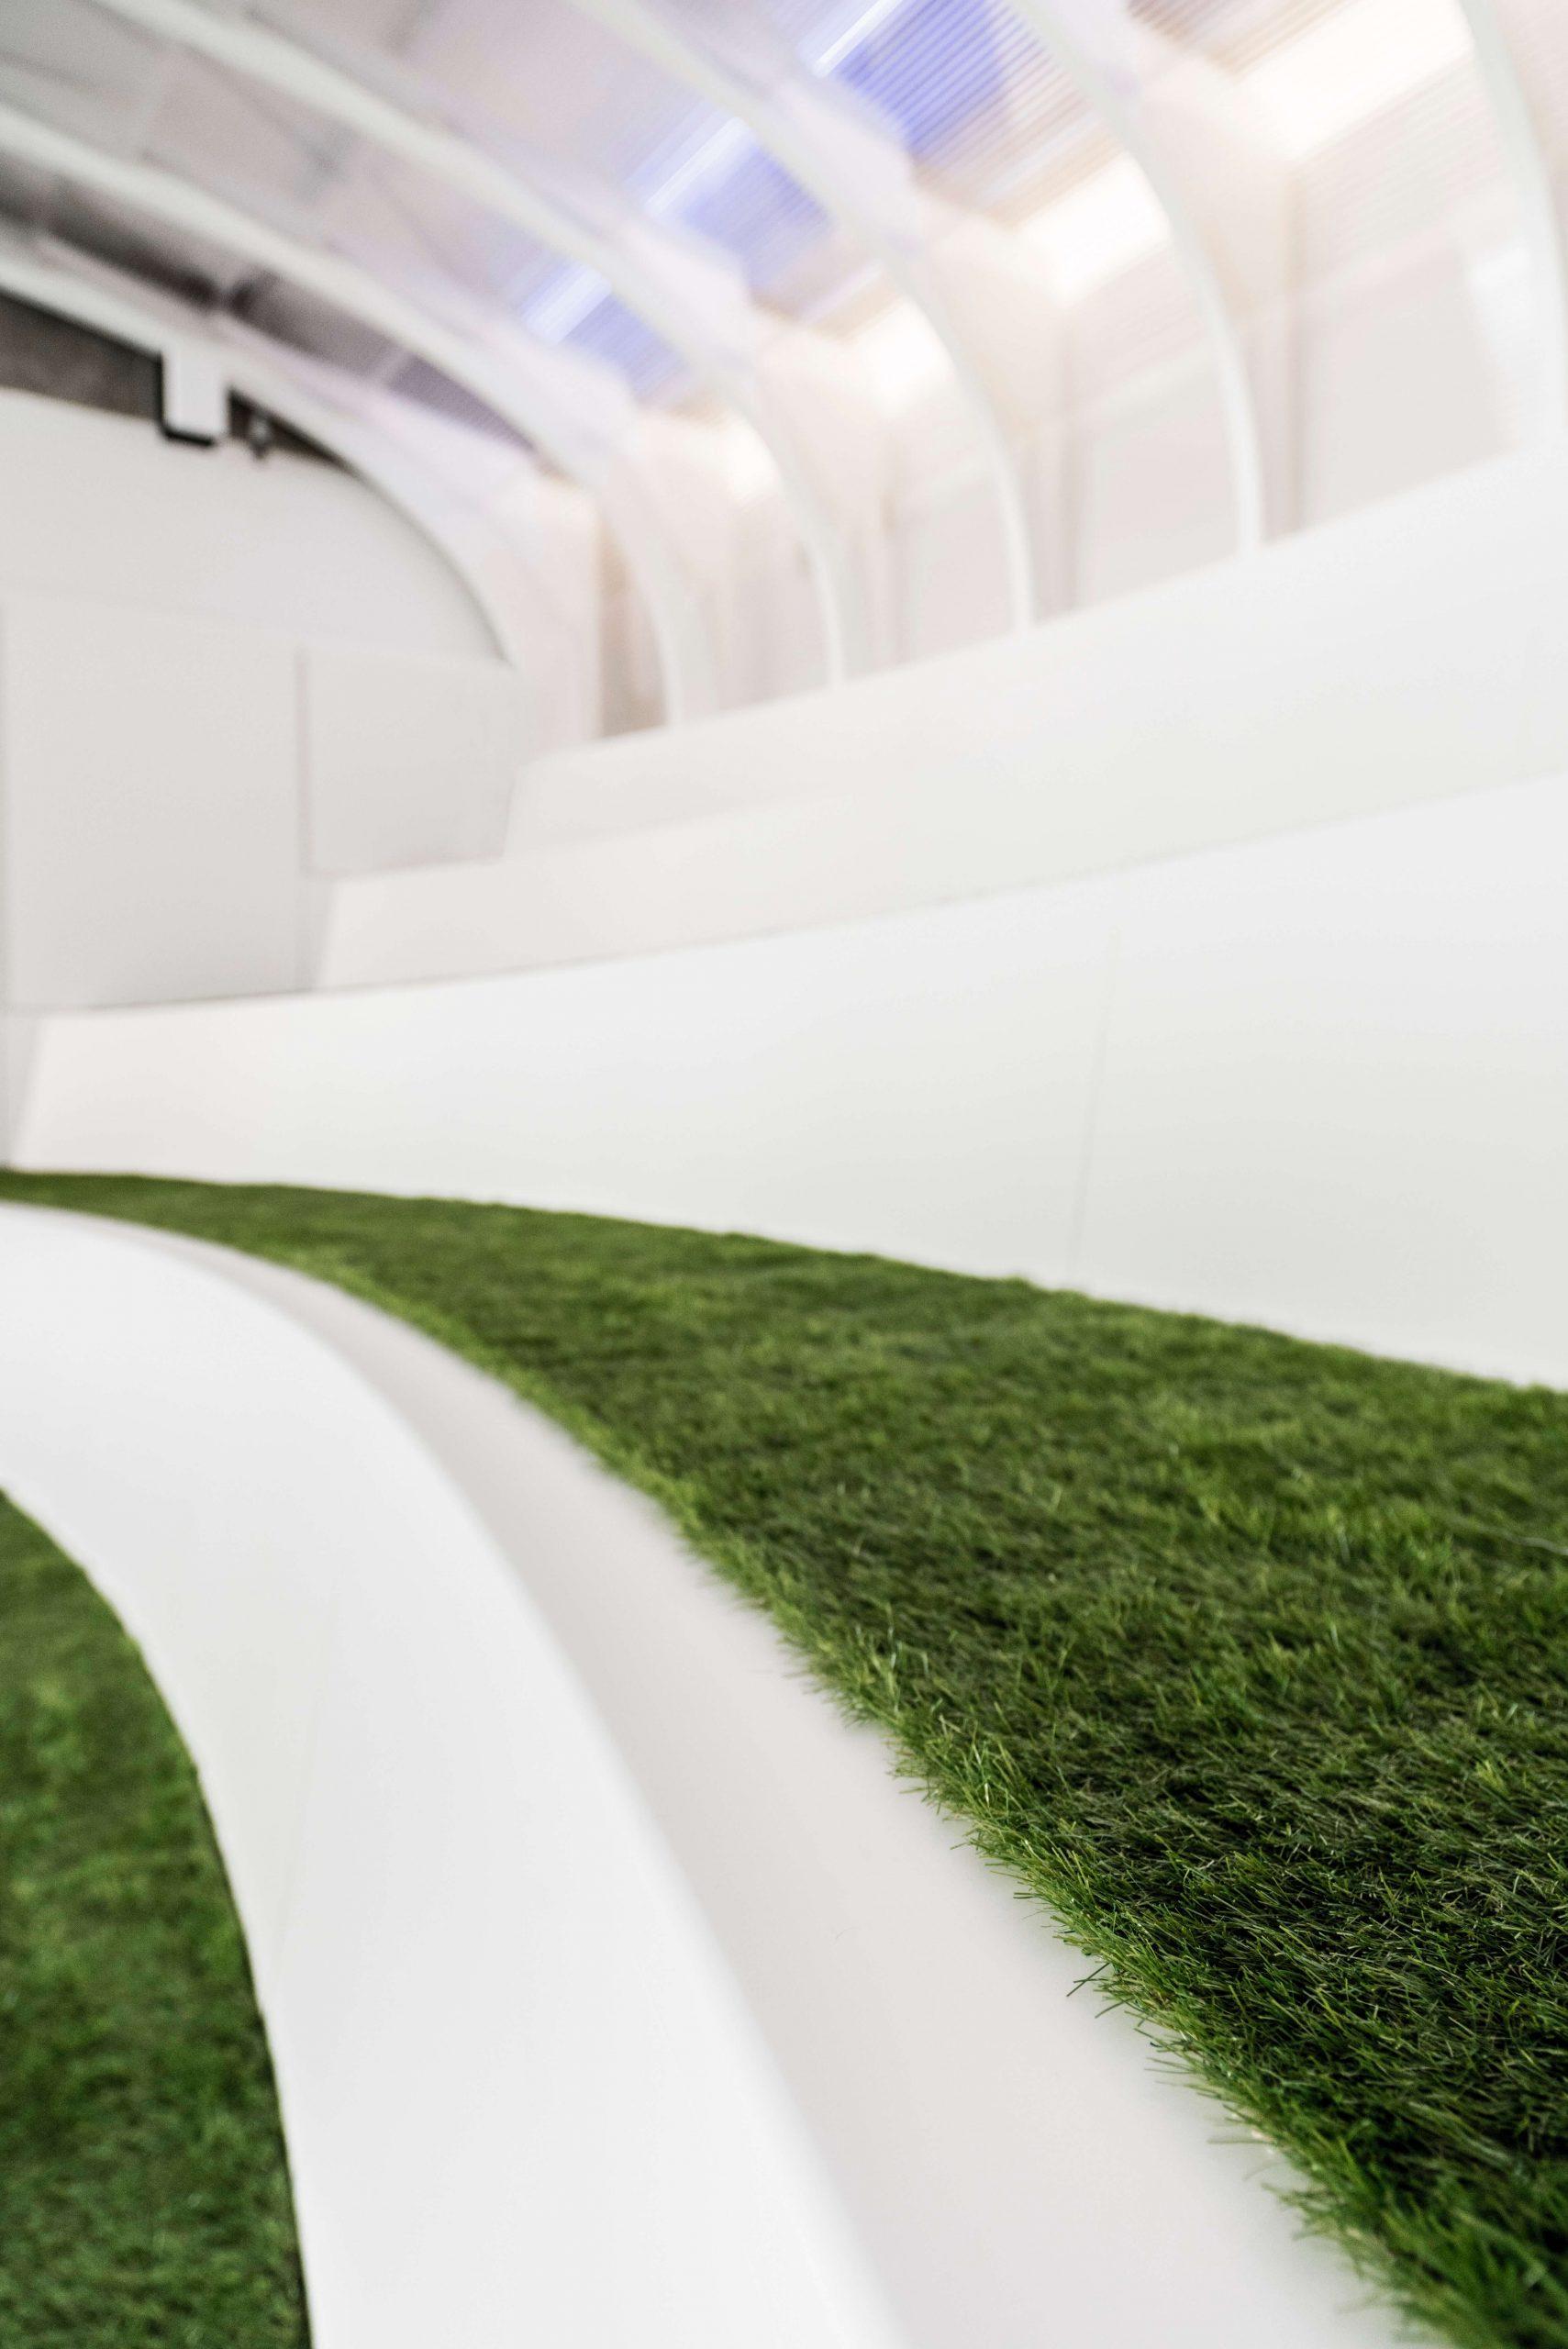 Startup Onefootball Office Design TKEZ Architekten Arena mit Kunstrasen